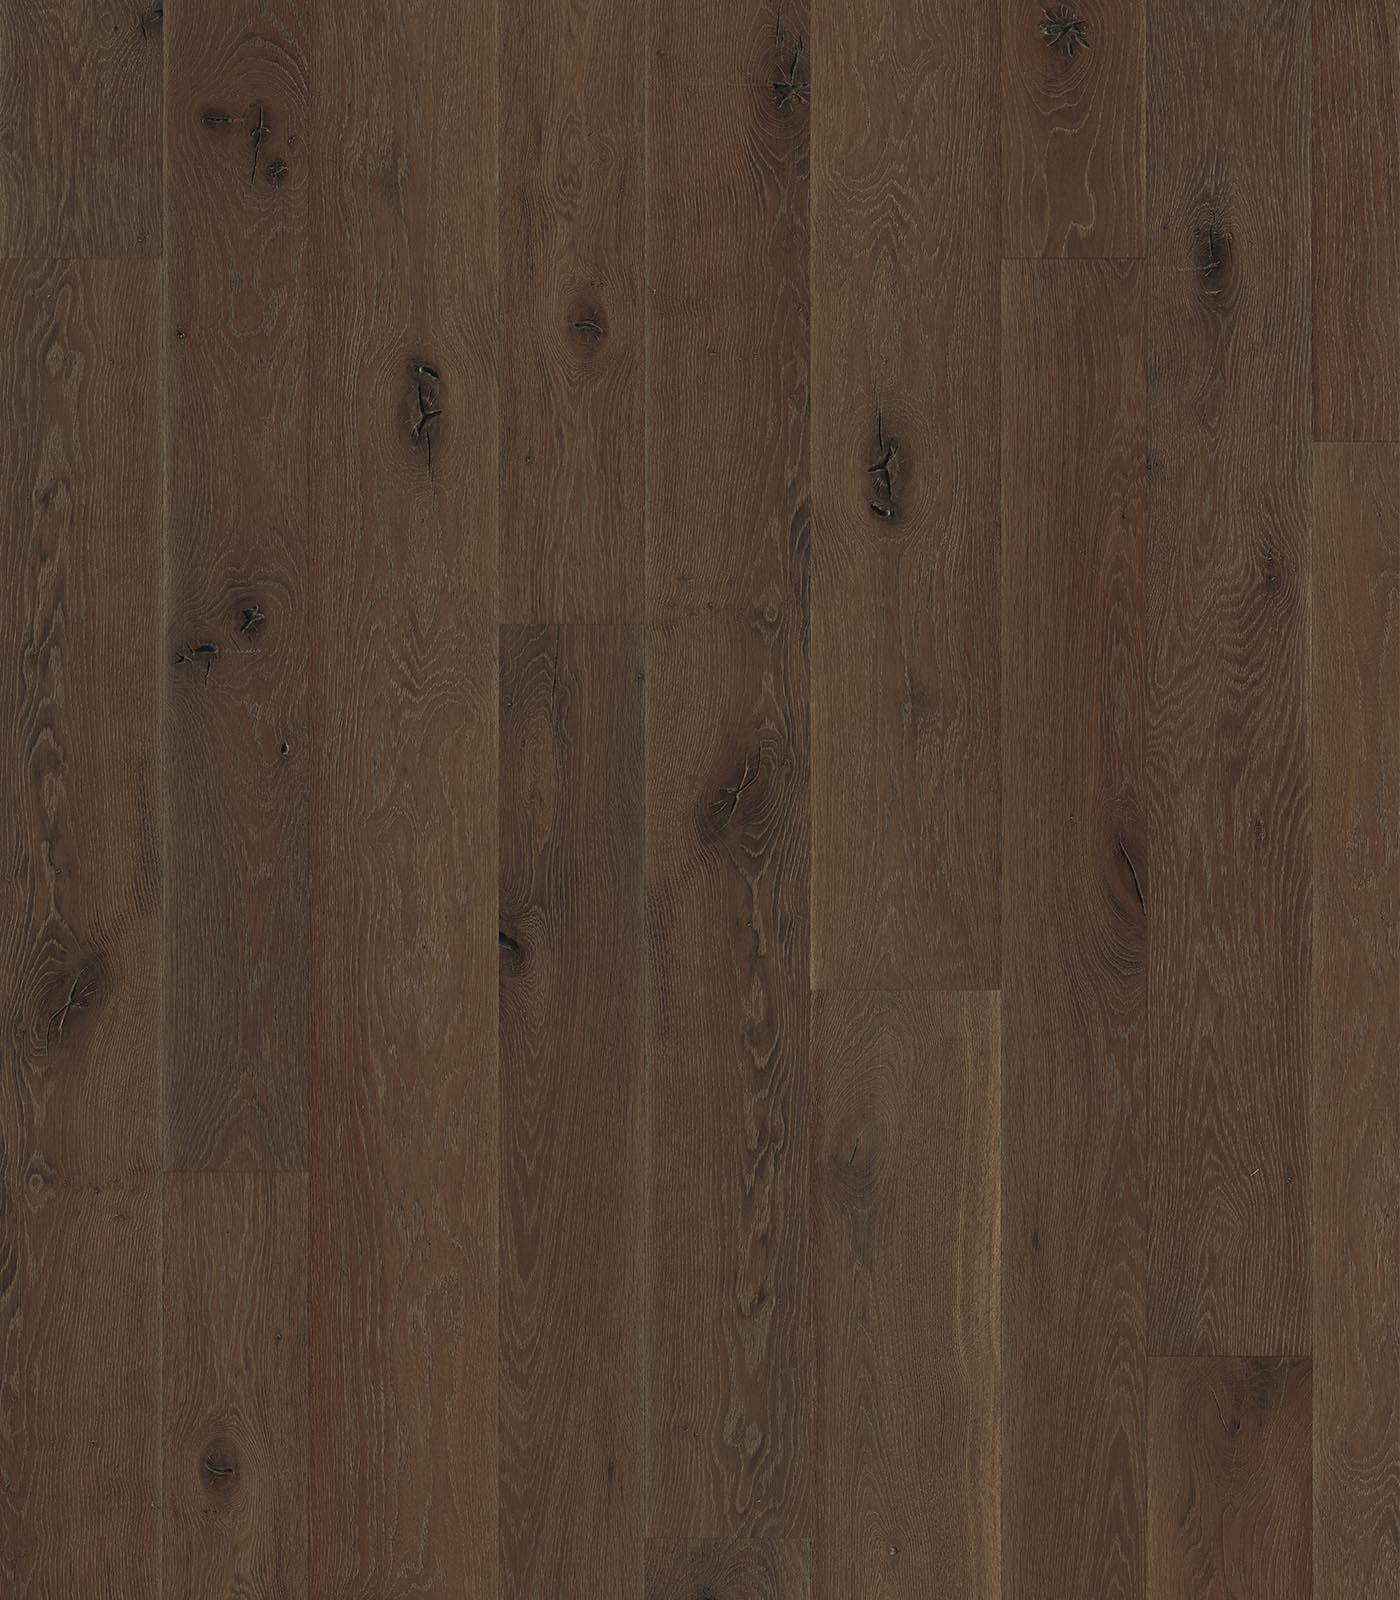 Strasbourg-Heritage Collection-European Oak Floors-flat